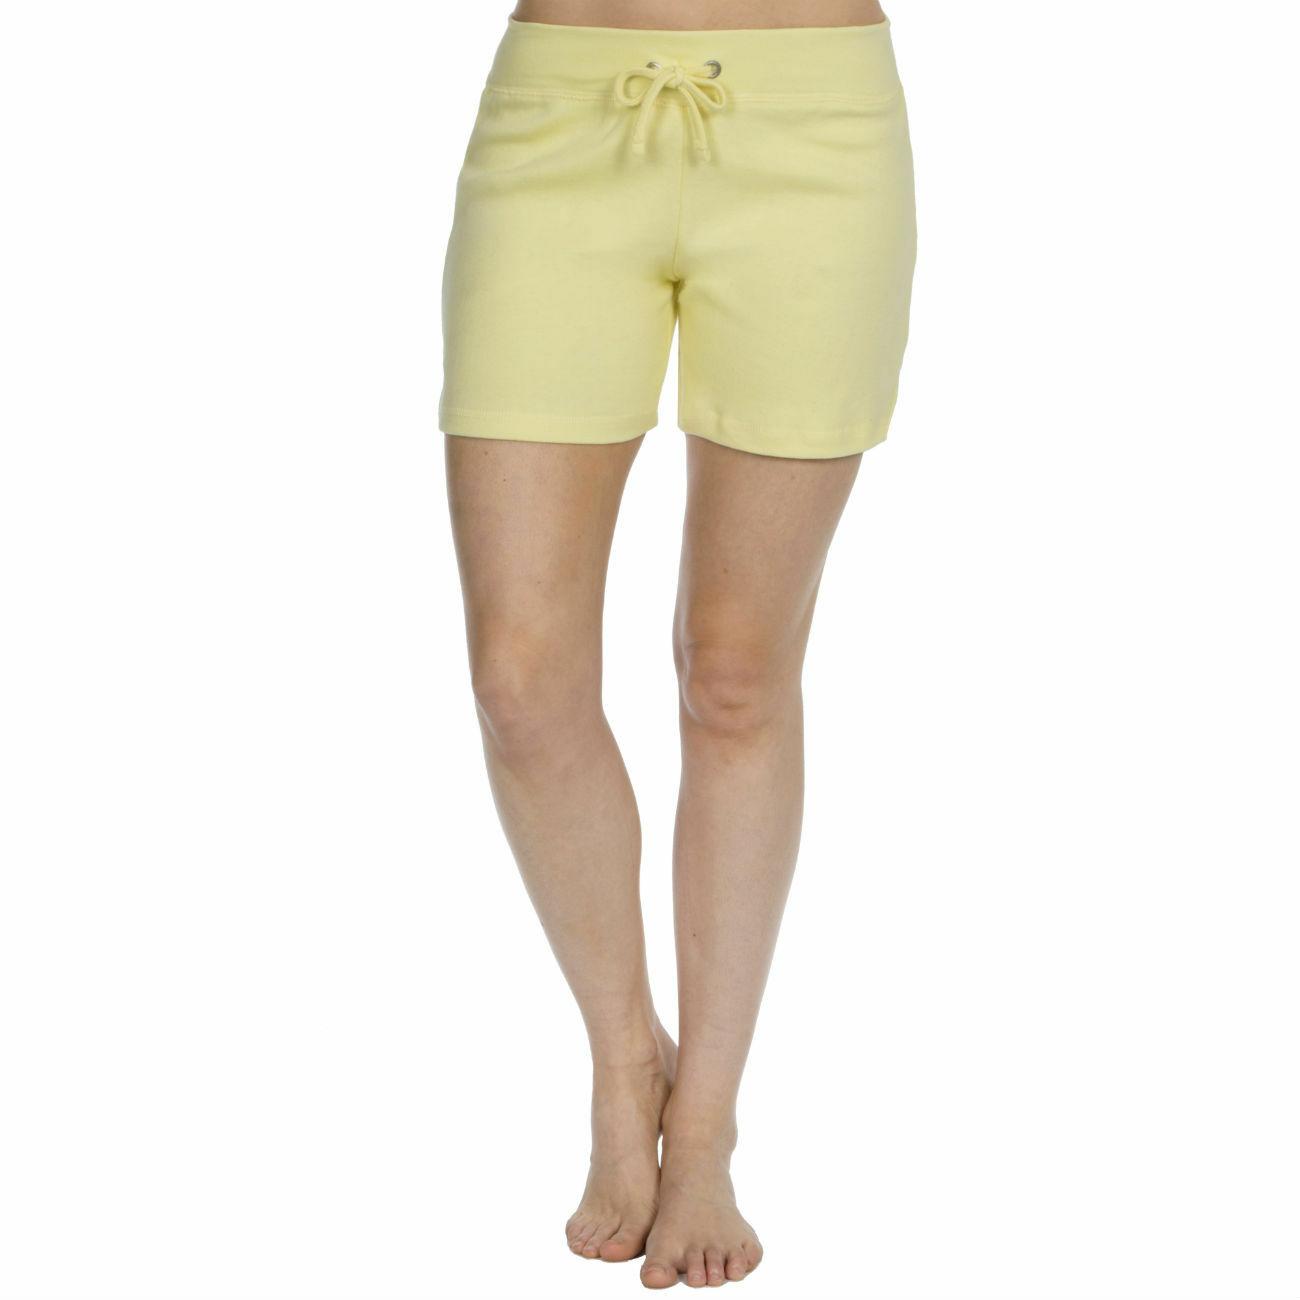 Womens-Cotton-Jersey-Shorts-Elastic-Waist-Summer-Beach-Casual-Yoga-Hot-Pants-New thumbnail 39